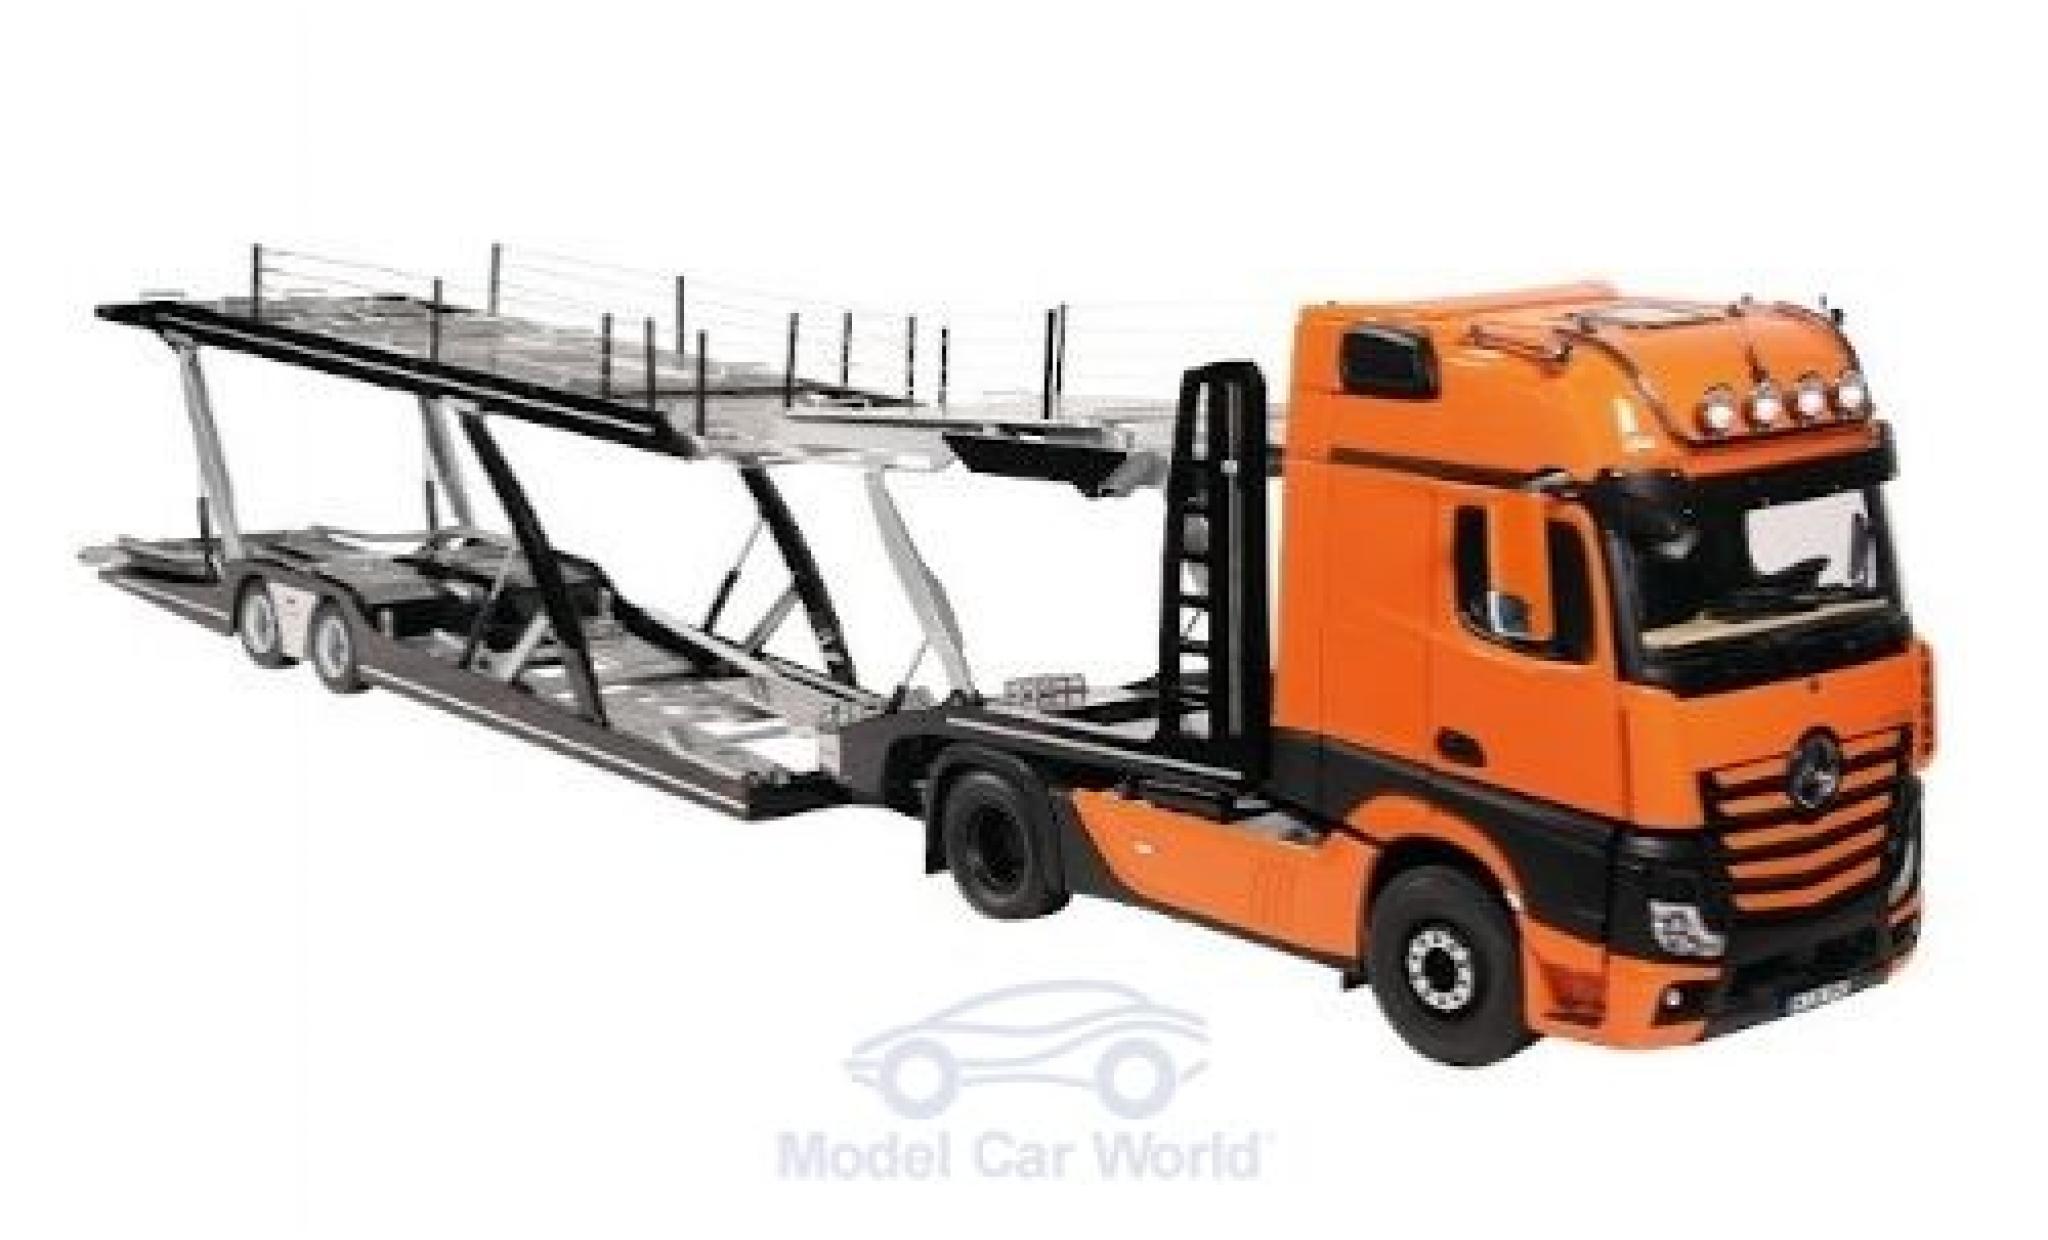 Mercedes Actros 1/18 NZG GigaSpace 4X2 FH25 orange/black Autotransporter